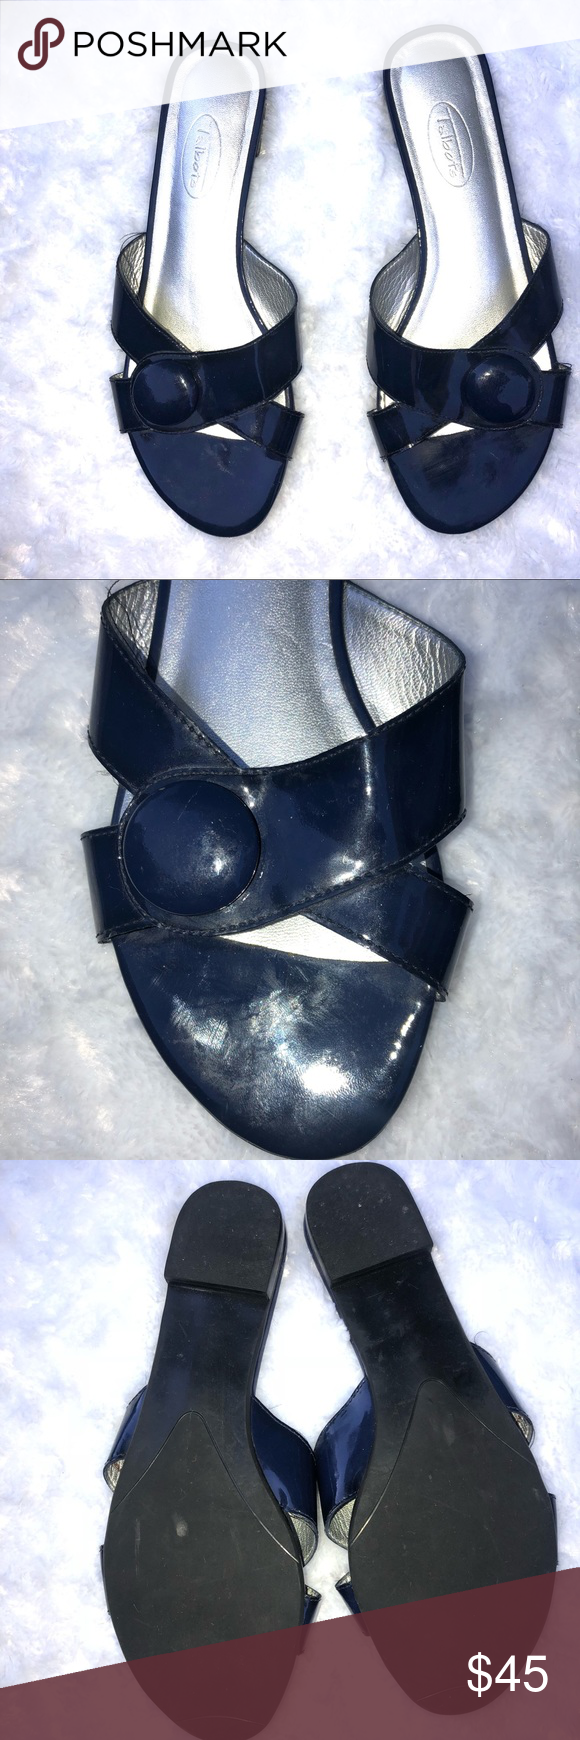 Talbots navy sandals size 8B Talbots navy sandals size 8B